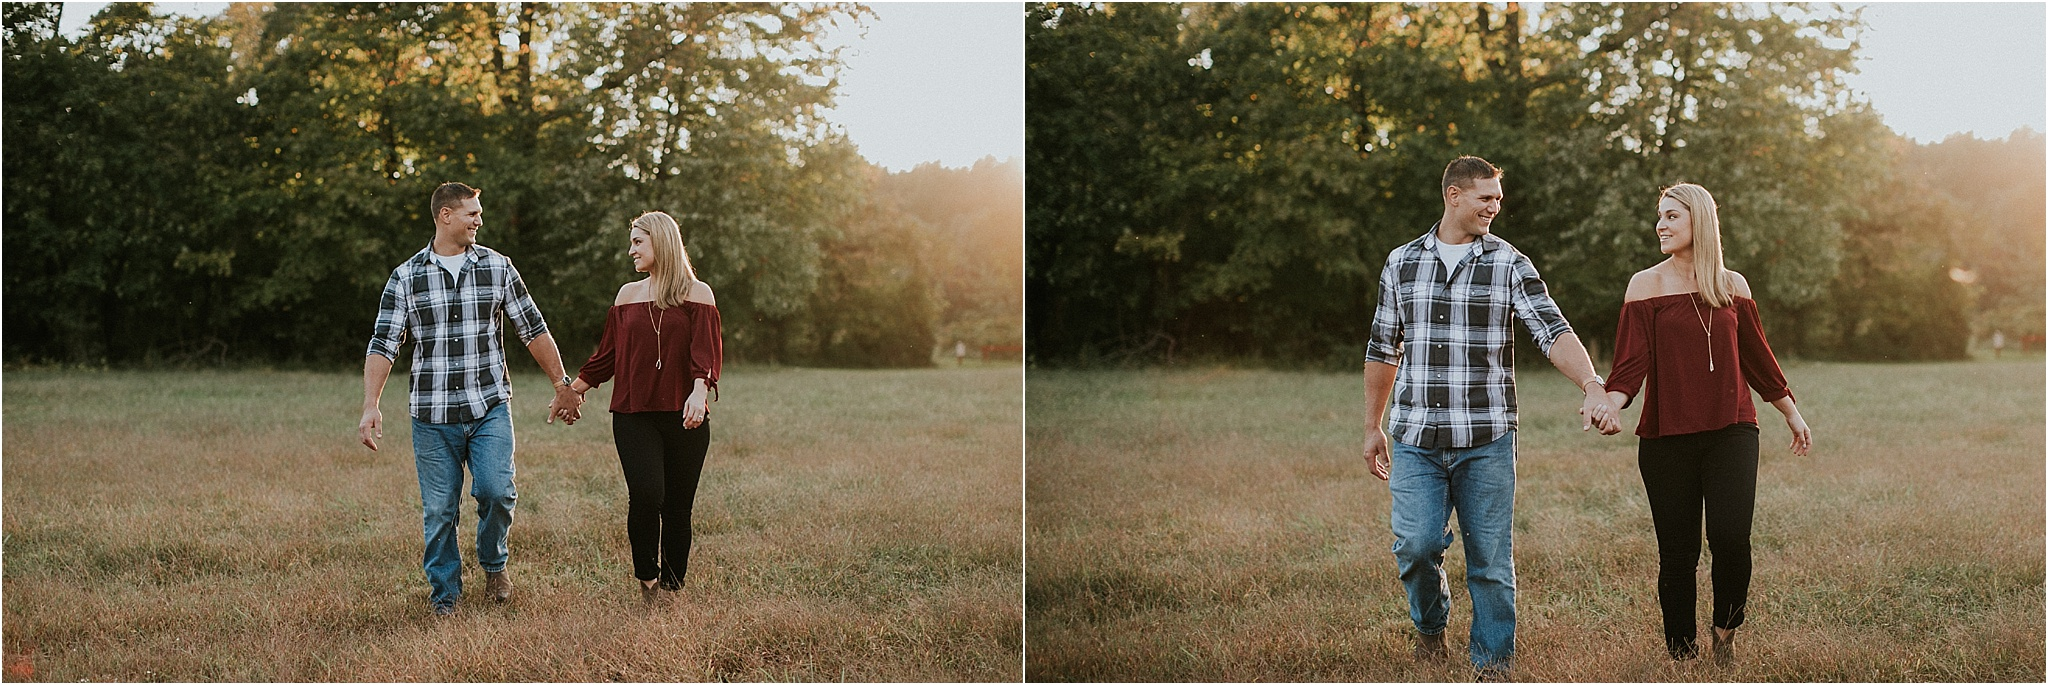 Haley Dylan Riverdale Manor Photographer_0090.jpg